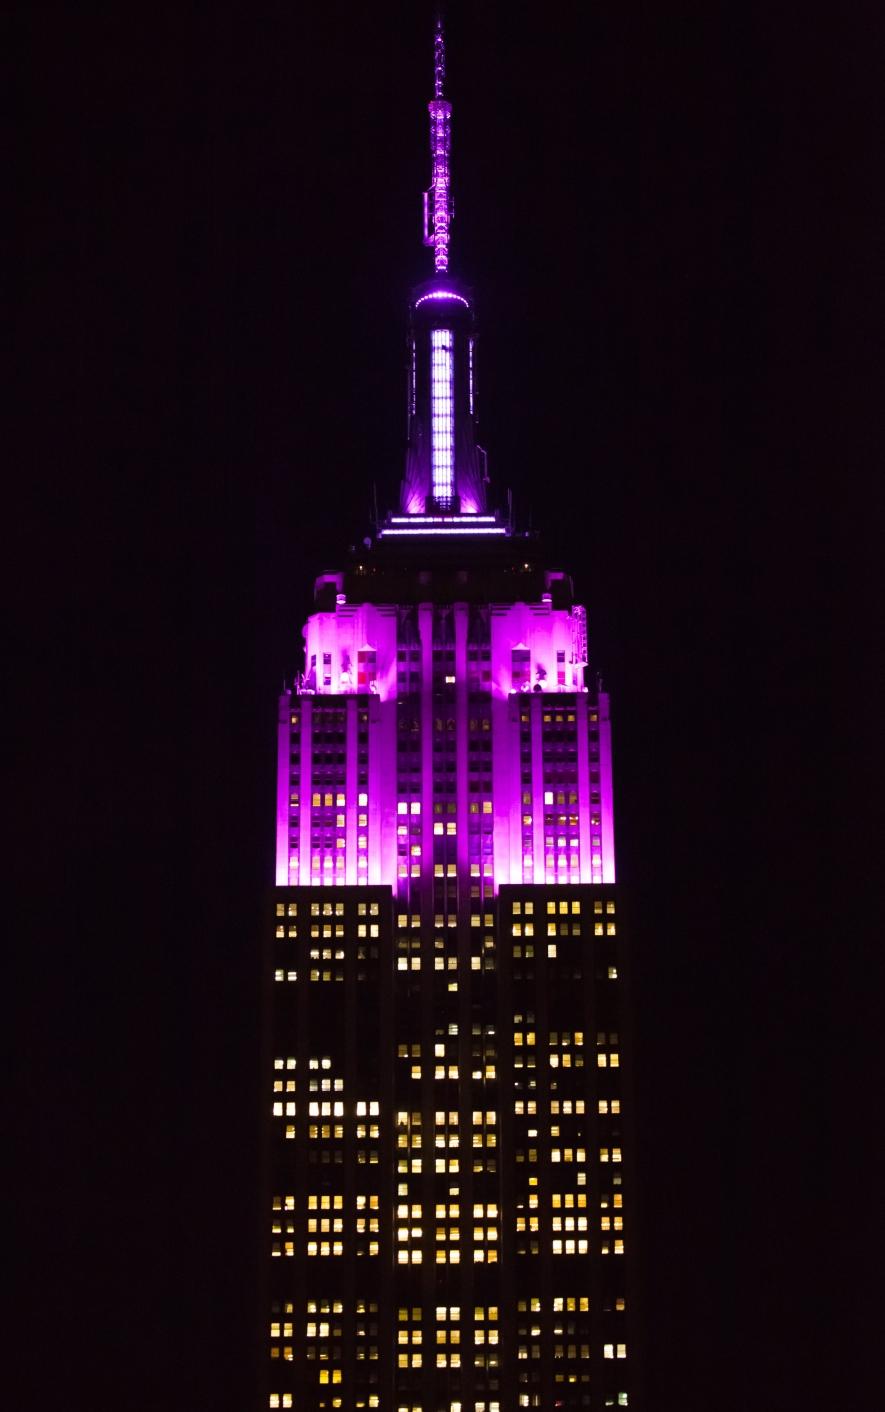 Pinterest & Tower Lighting 2017-11-17 00:00:00   Empire State Building azcodes.com